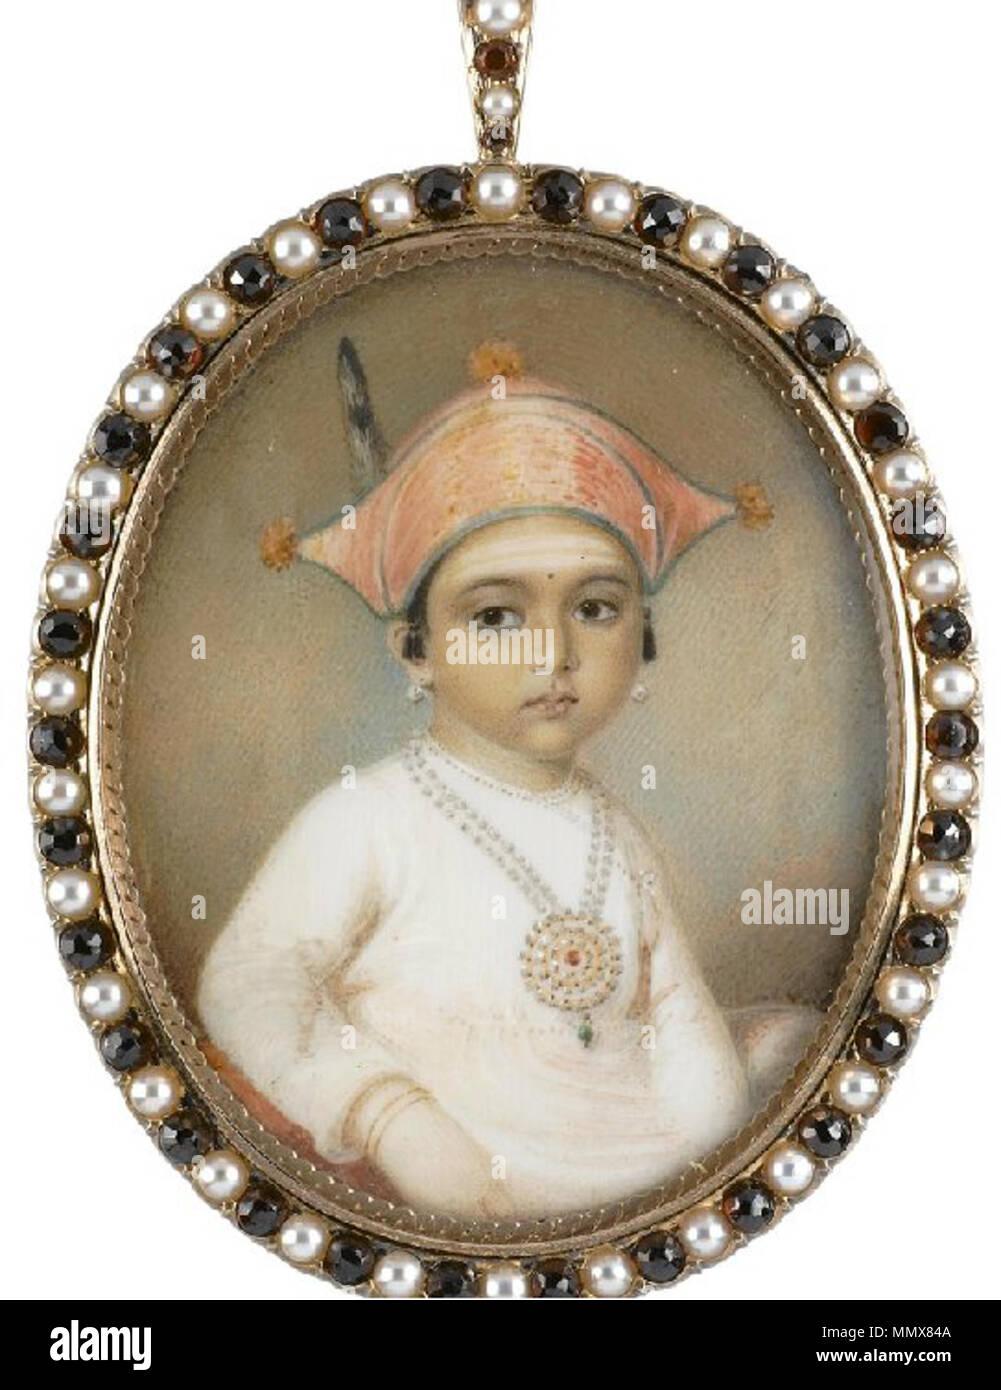 . Portrait of Mooda Maji of Coorg. Watercolor on ivory miniature. 2.9 x 2.2 inches (7.3 x 5.7 cm).  . 1807. Edward Nash Edward Nash - Portrait of Mooda Maji of Coorg Stock Photo